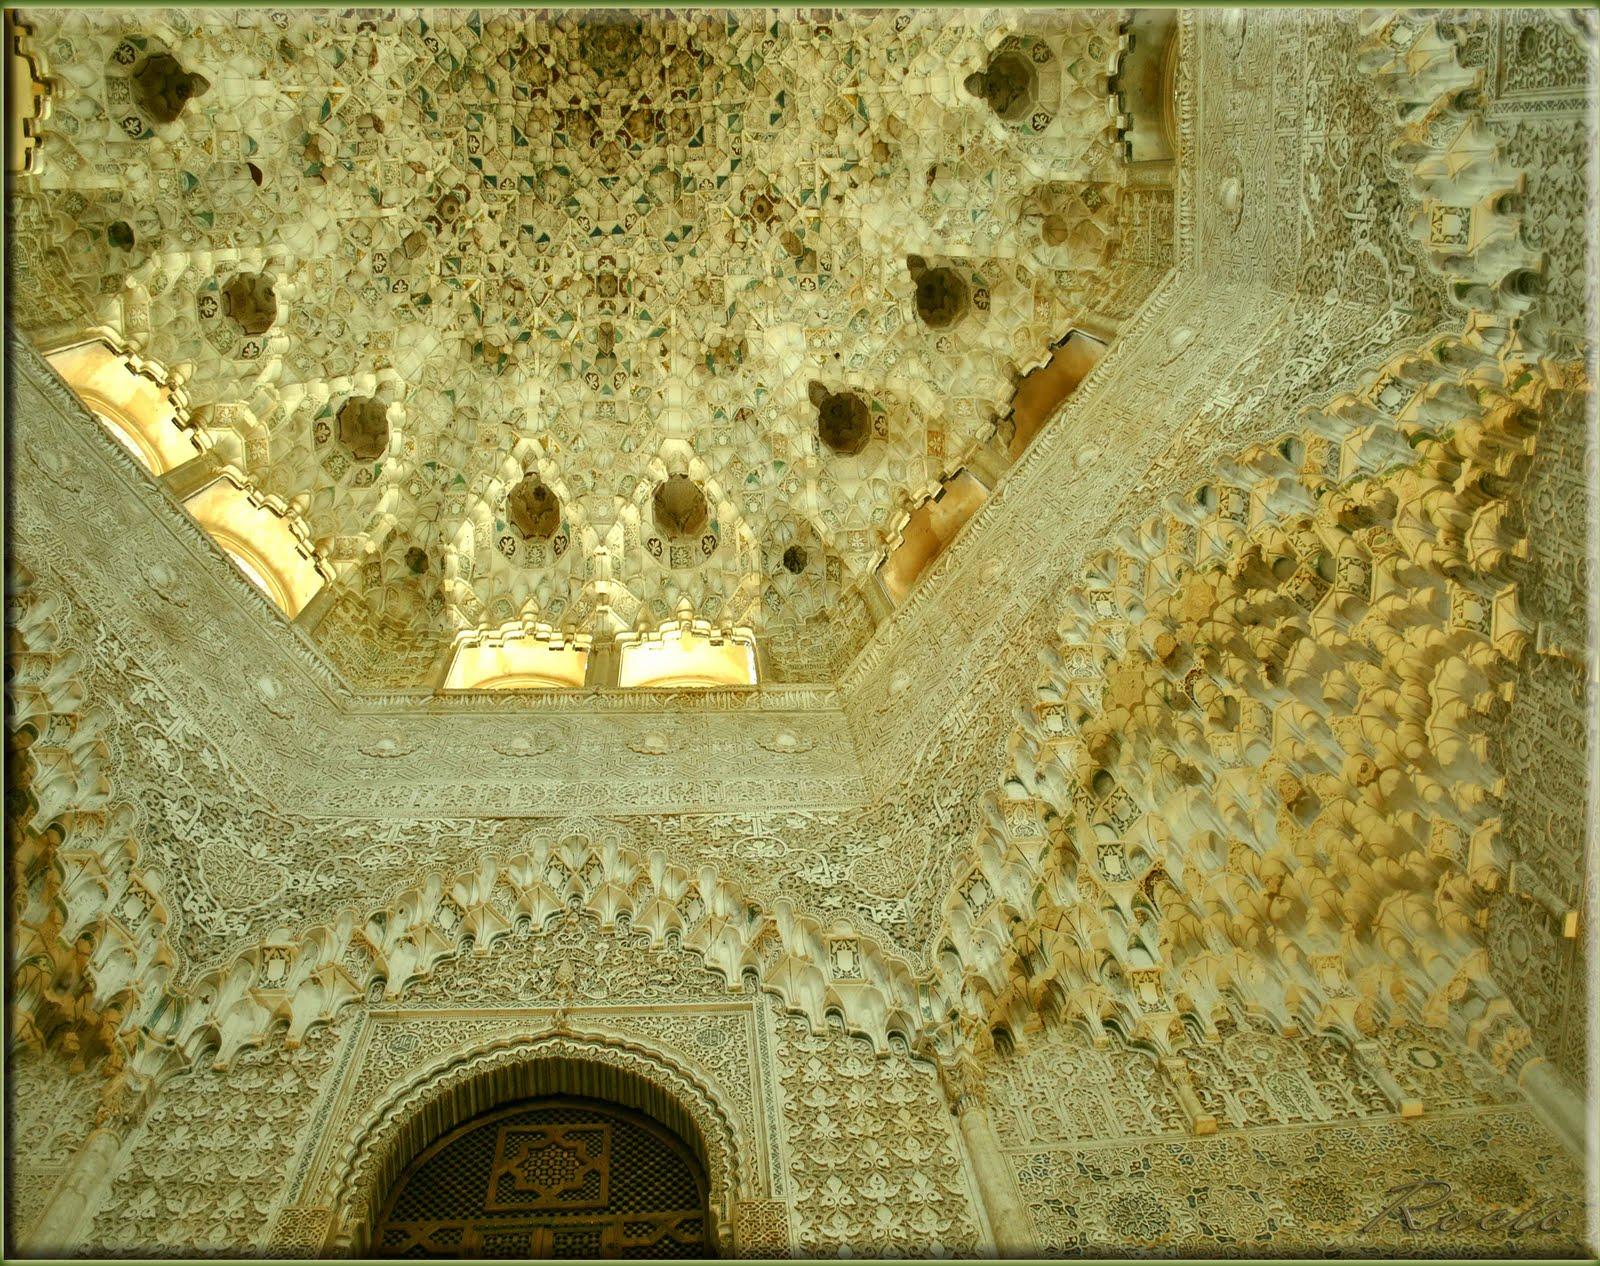 Muqarnas, Sala de las dos Hermanas, Alhambra